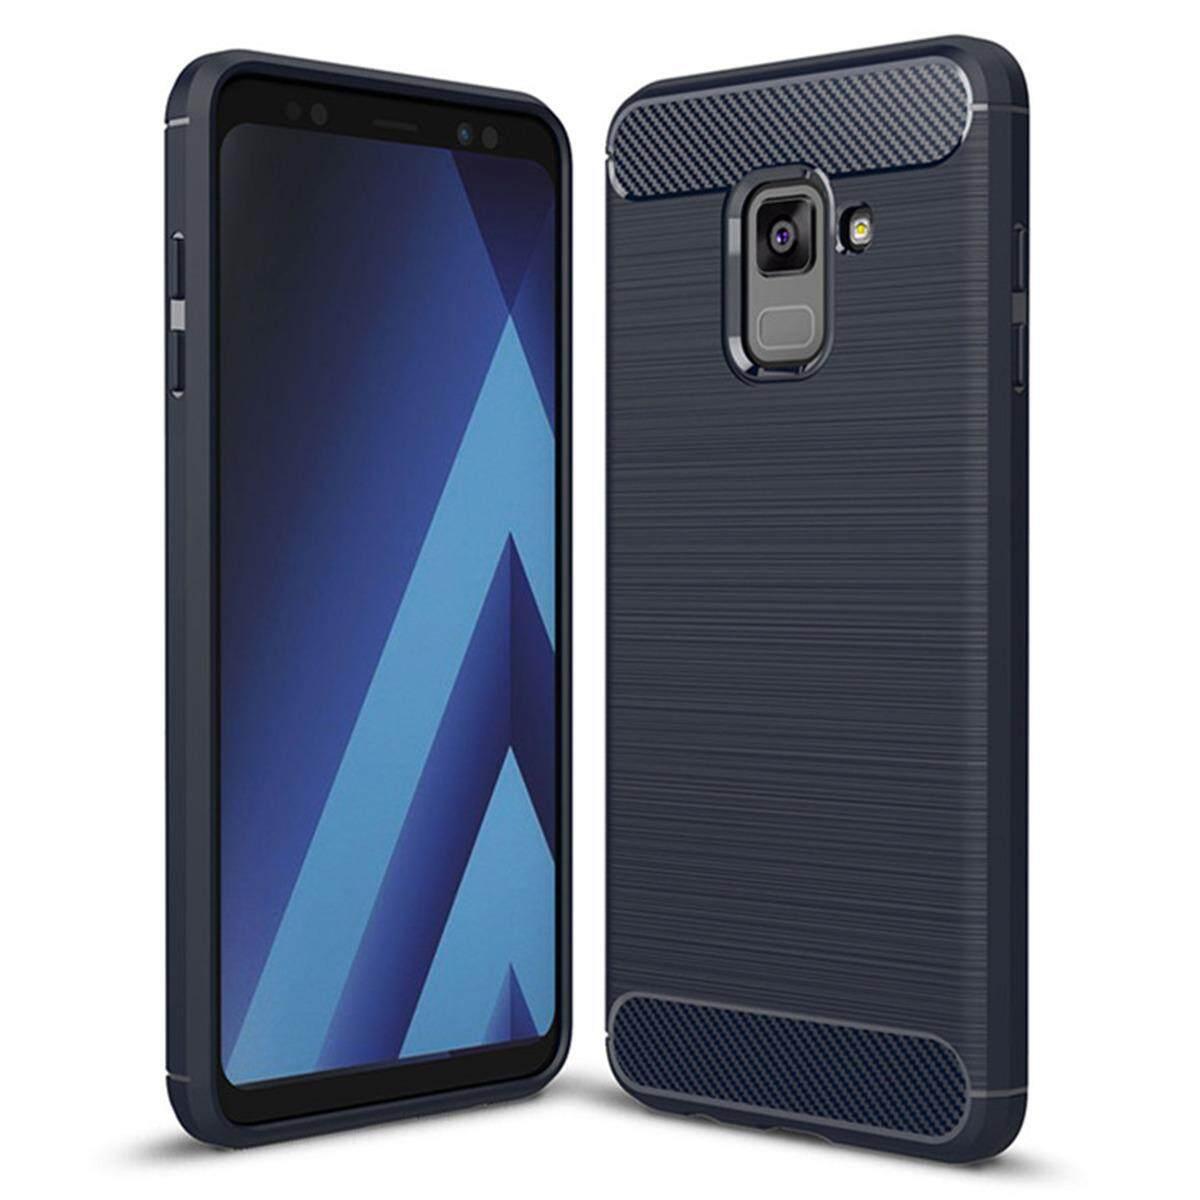 Hình ảnh for Samsung Galaxy A8 Plus(2018 Version) Case Carbon Fibre Hairline Ultrathin Soft TPU Back Case Cover, Light, Minimalist, Non-slip, Shockproof, Anti-scratch